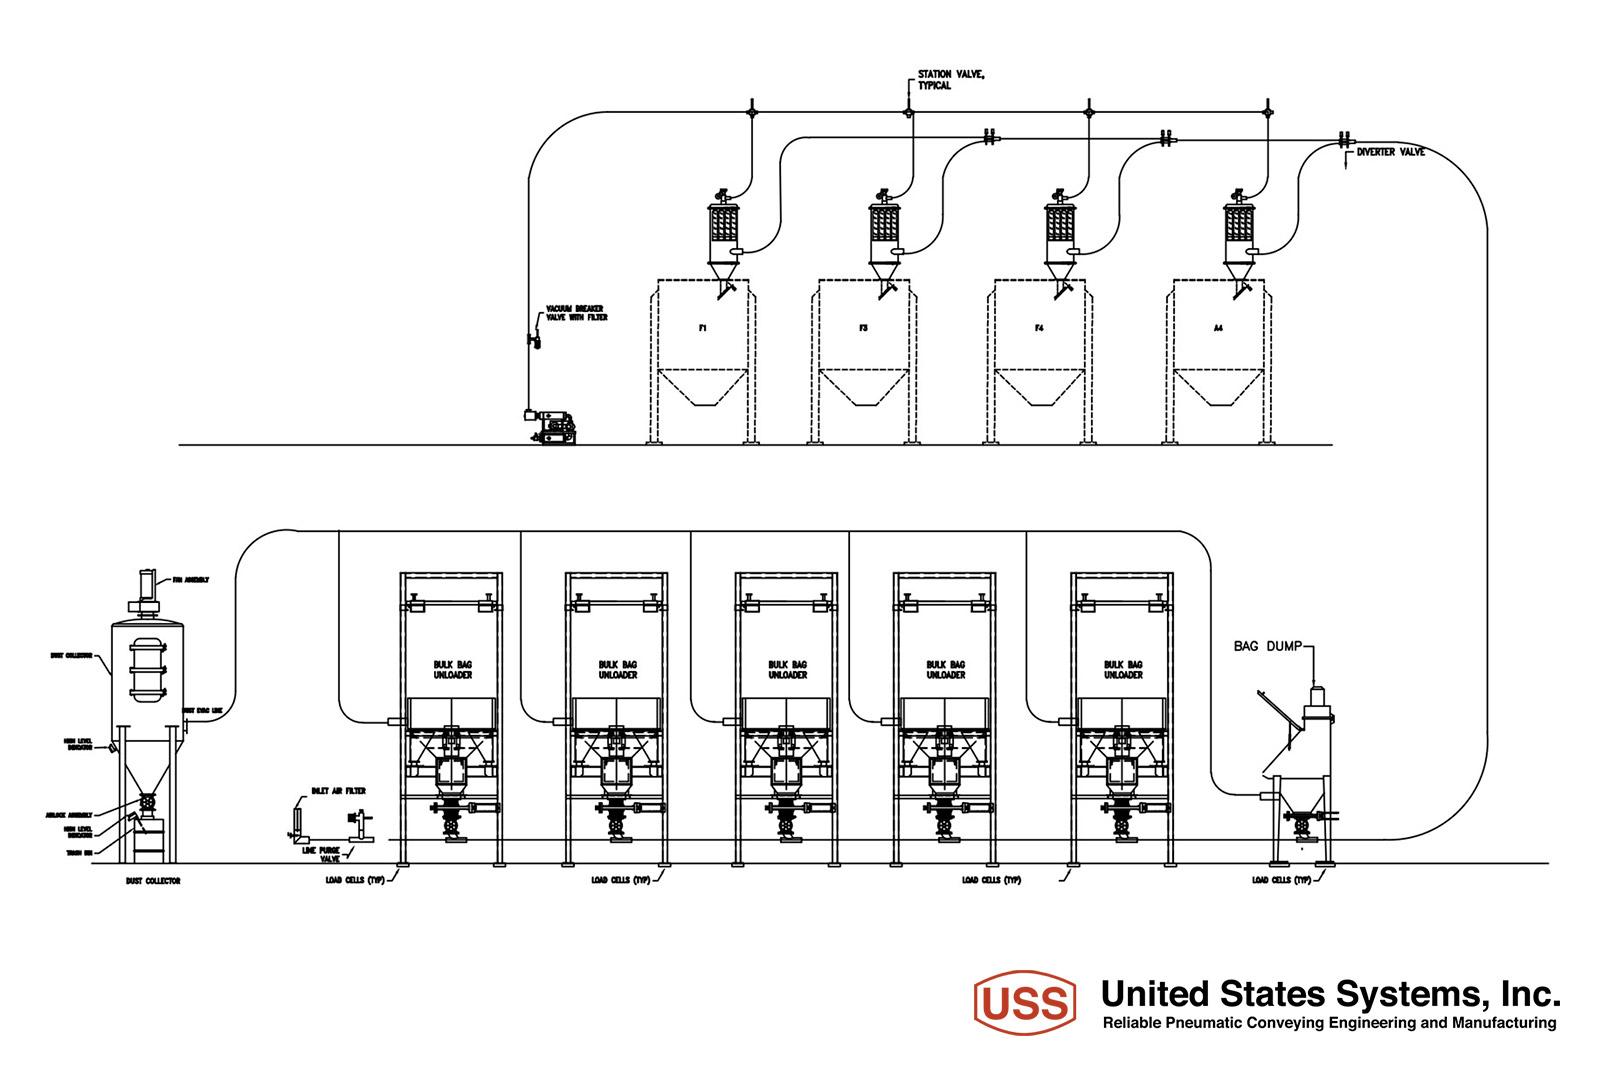 Process Diagrams